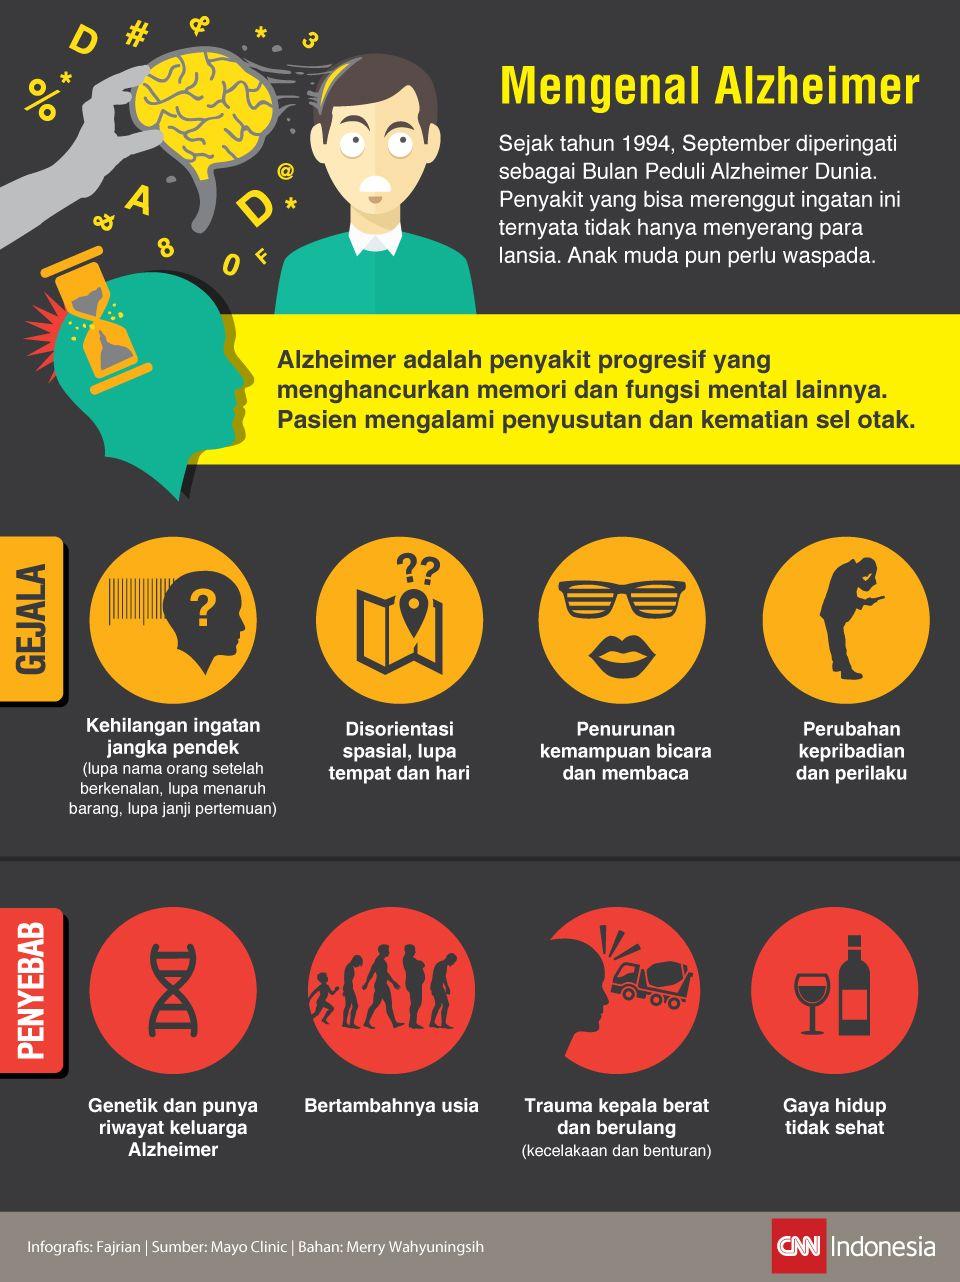 Gejala dan penyebab penyakit Alzheimer dalam infografis